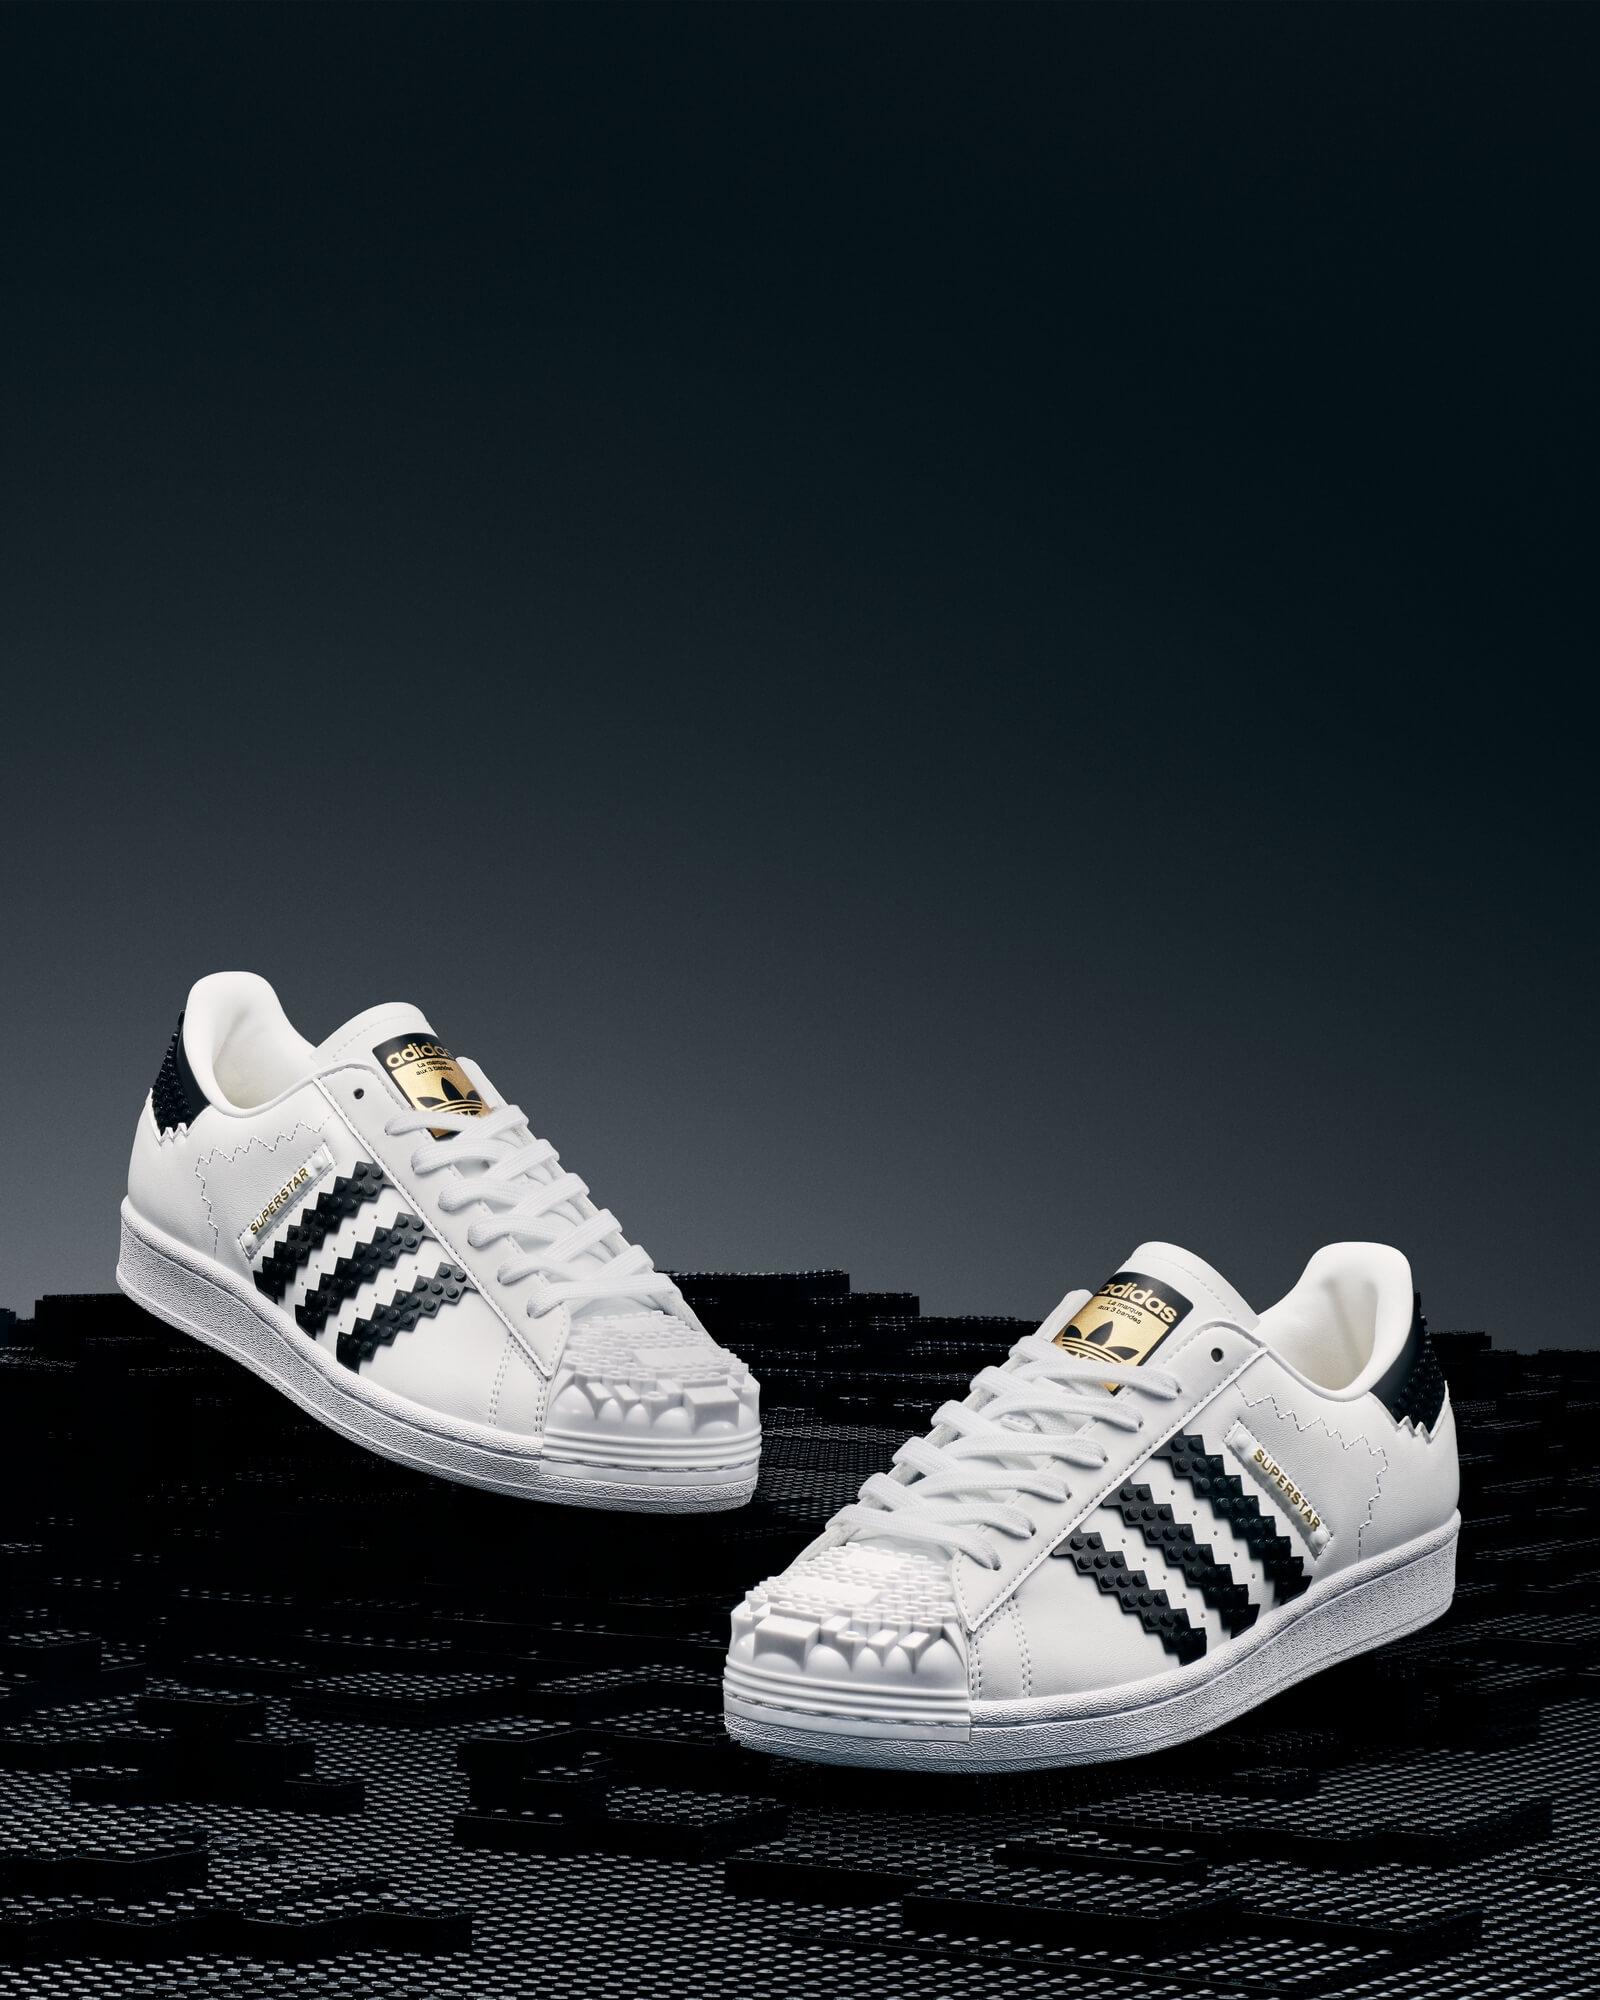 adidas Originals x LEGO - Superstar collaboration sneaker release date